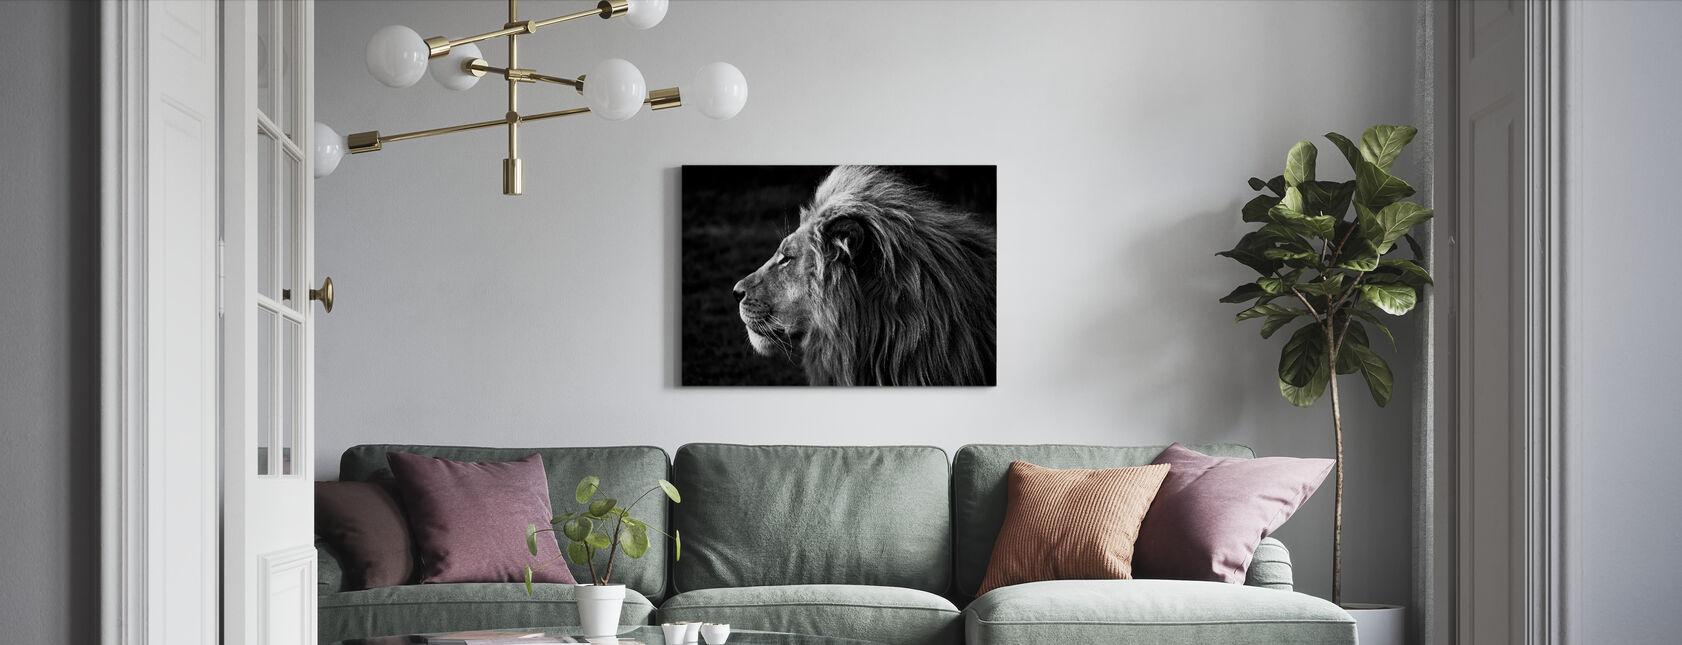 Leijona - Canvastaulu - Olohuone